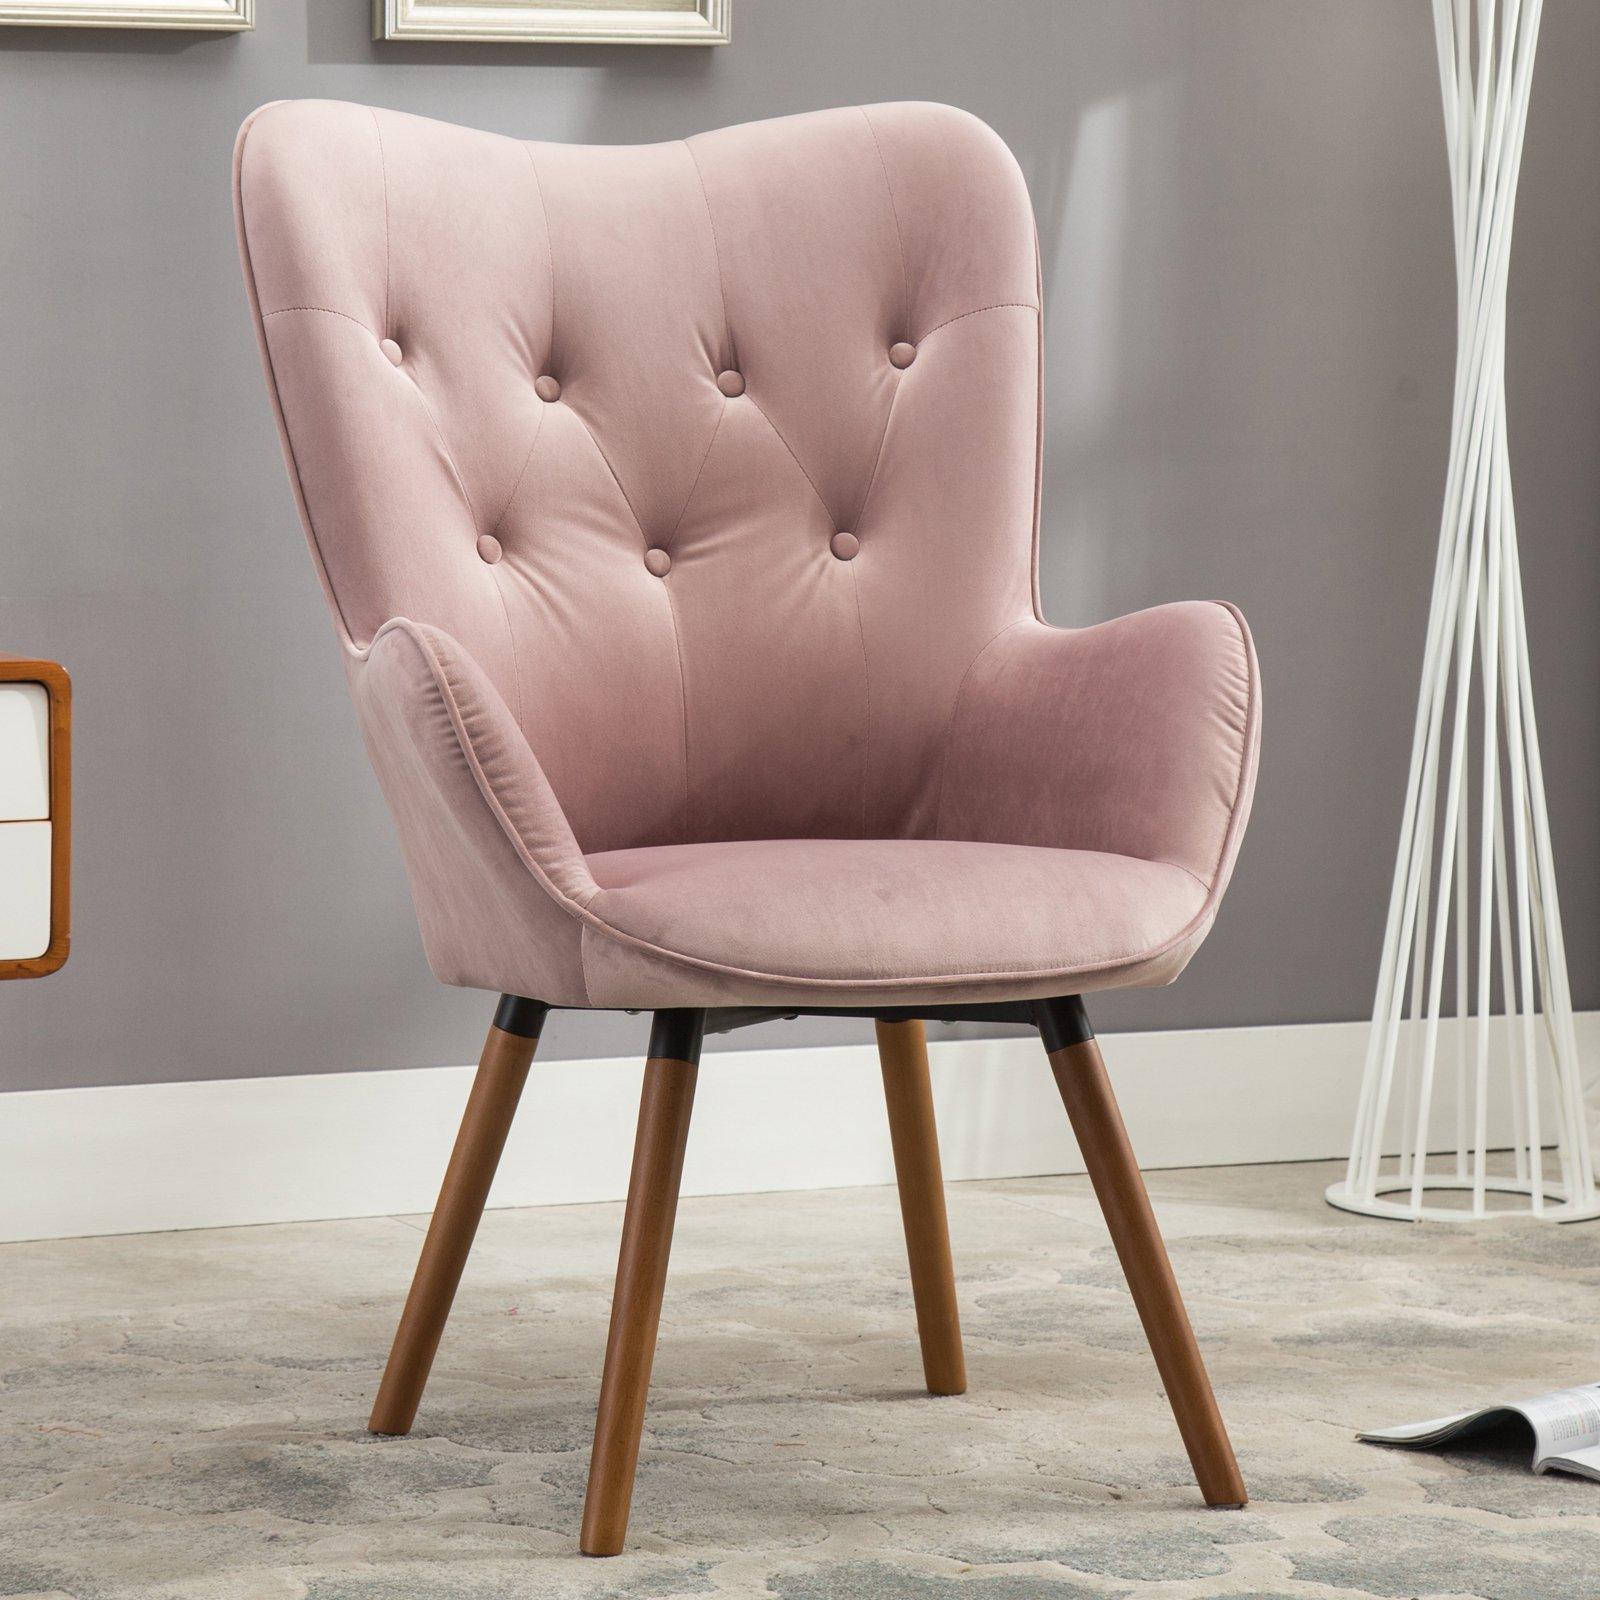 velvet armchair pink chair design inspiration upholstered accent high back blush tufted details